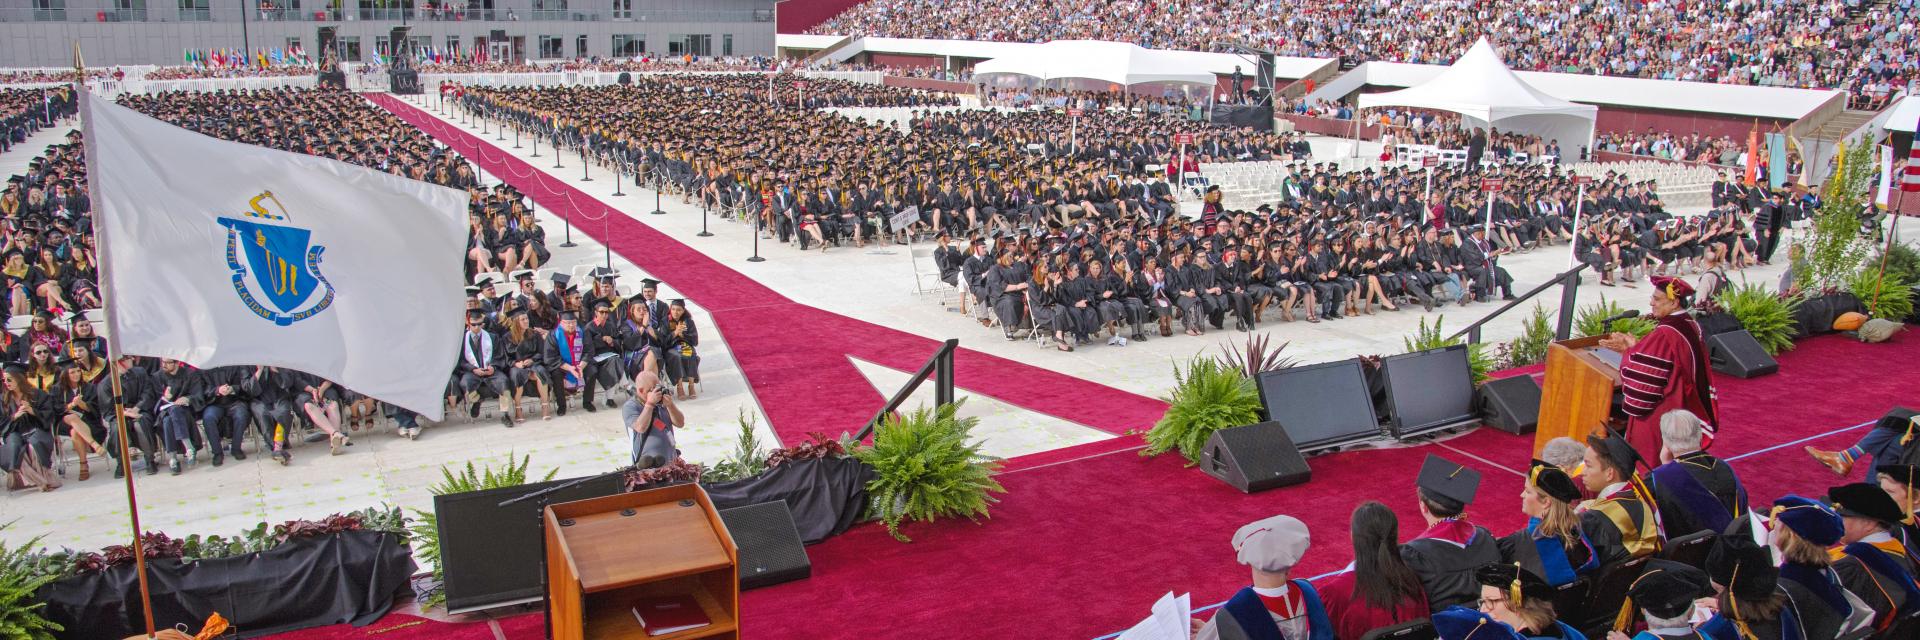 Undergraduate Commencement Ceremony 2018